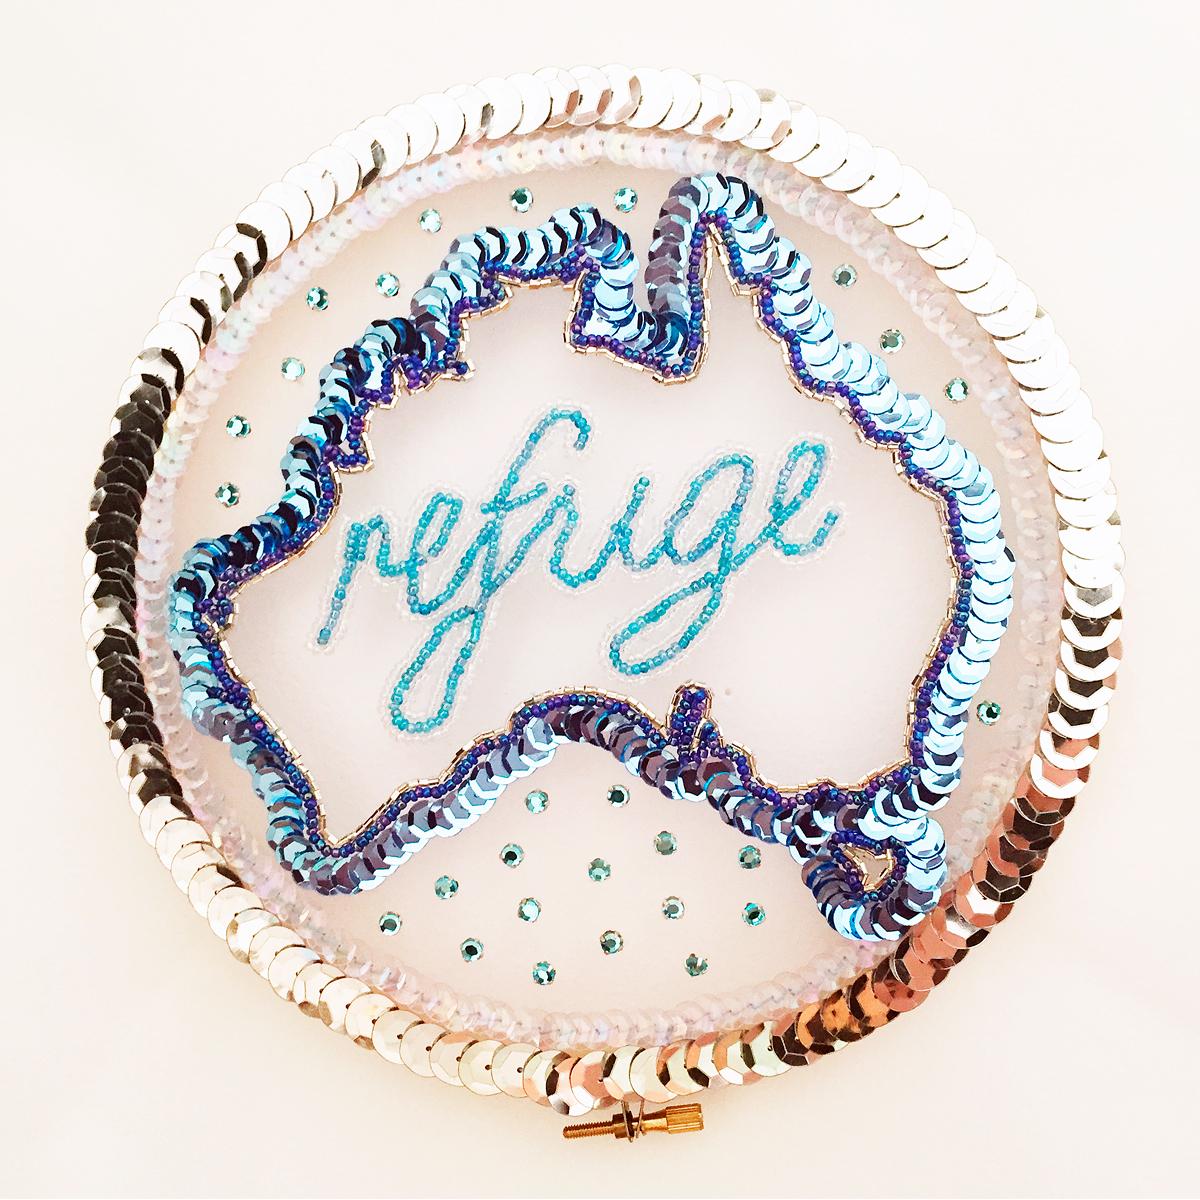 Artereal_Gallery_2015_Liam_Benson_Refuge